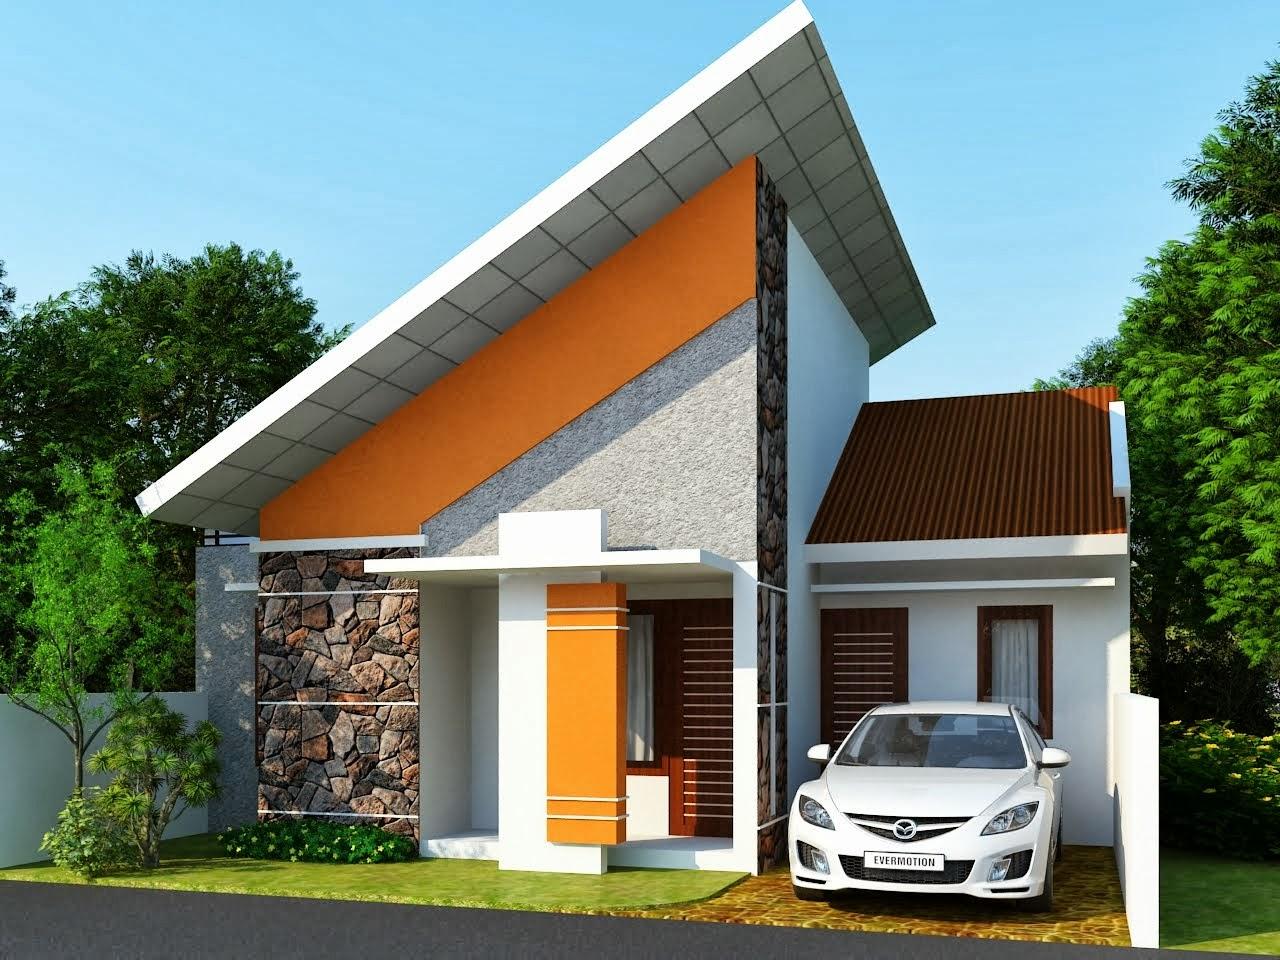 Contoh Desain Rumah Mungil Minimalis Gambar Desain Rumah Minimalis